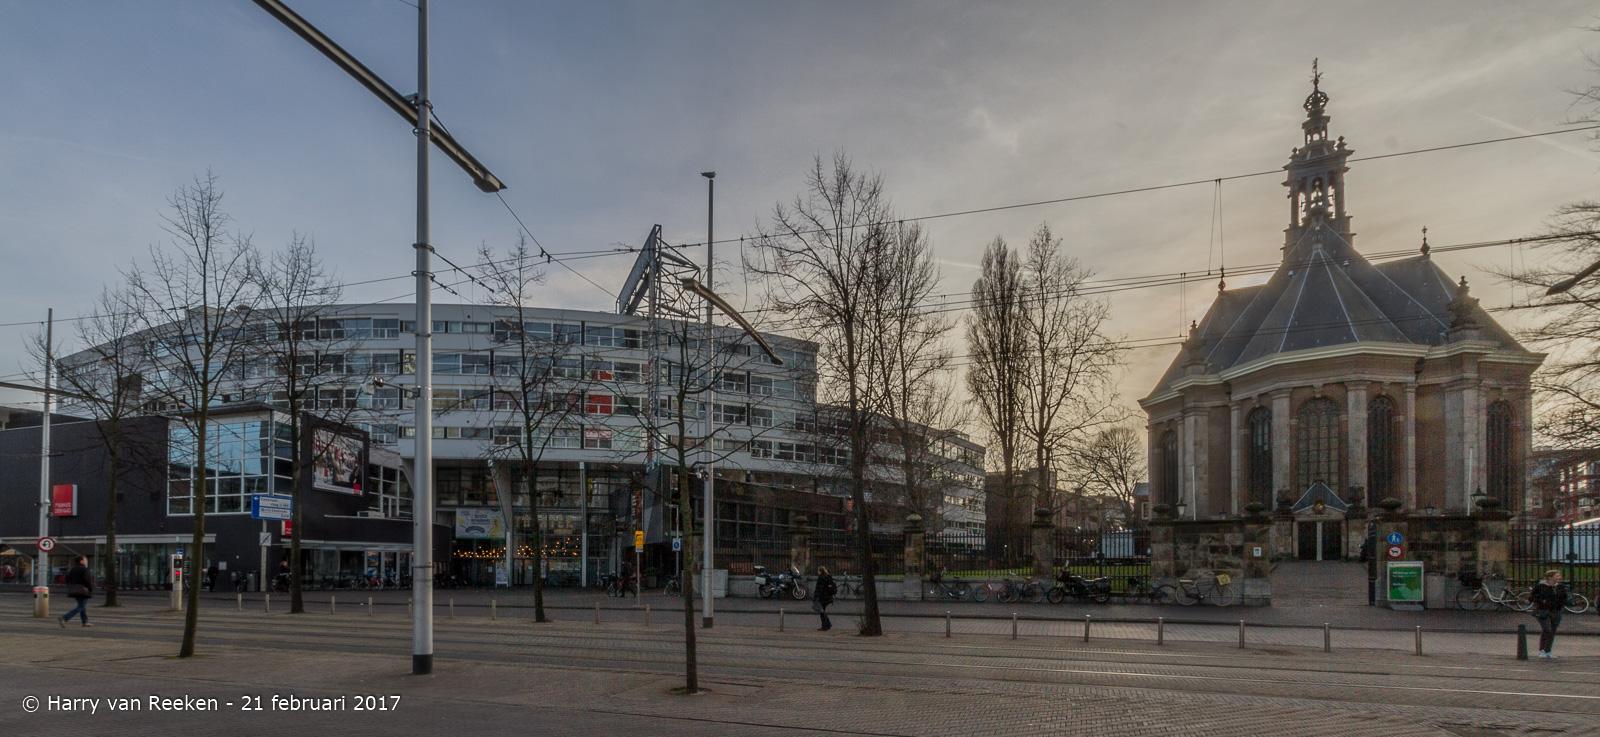 Spui-Nieuwe Kerk-theater aan het spui-1-HDR